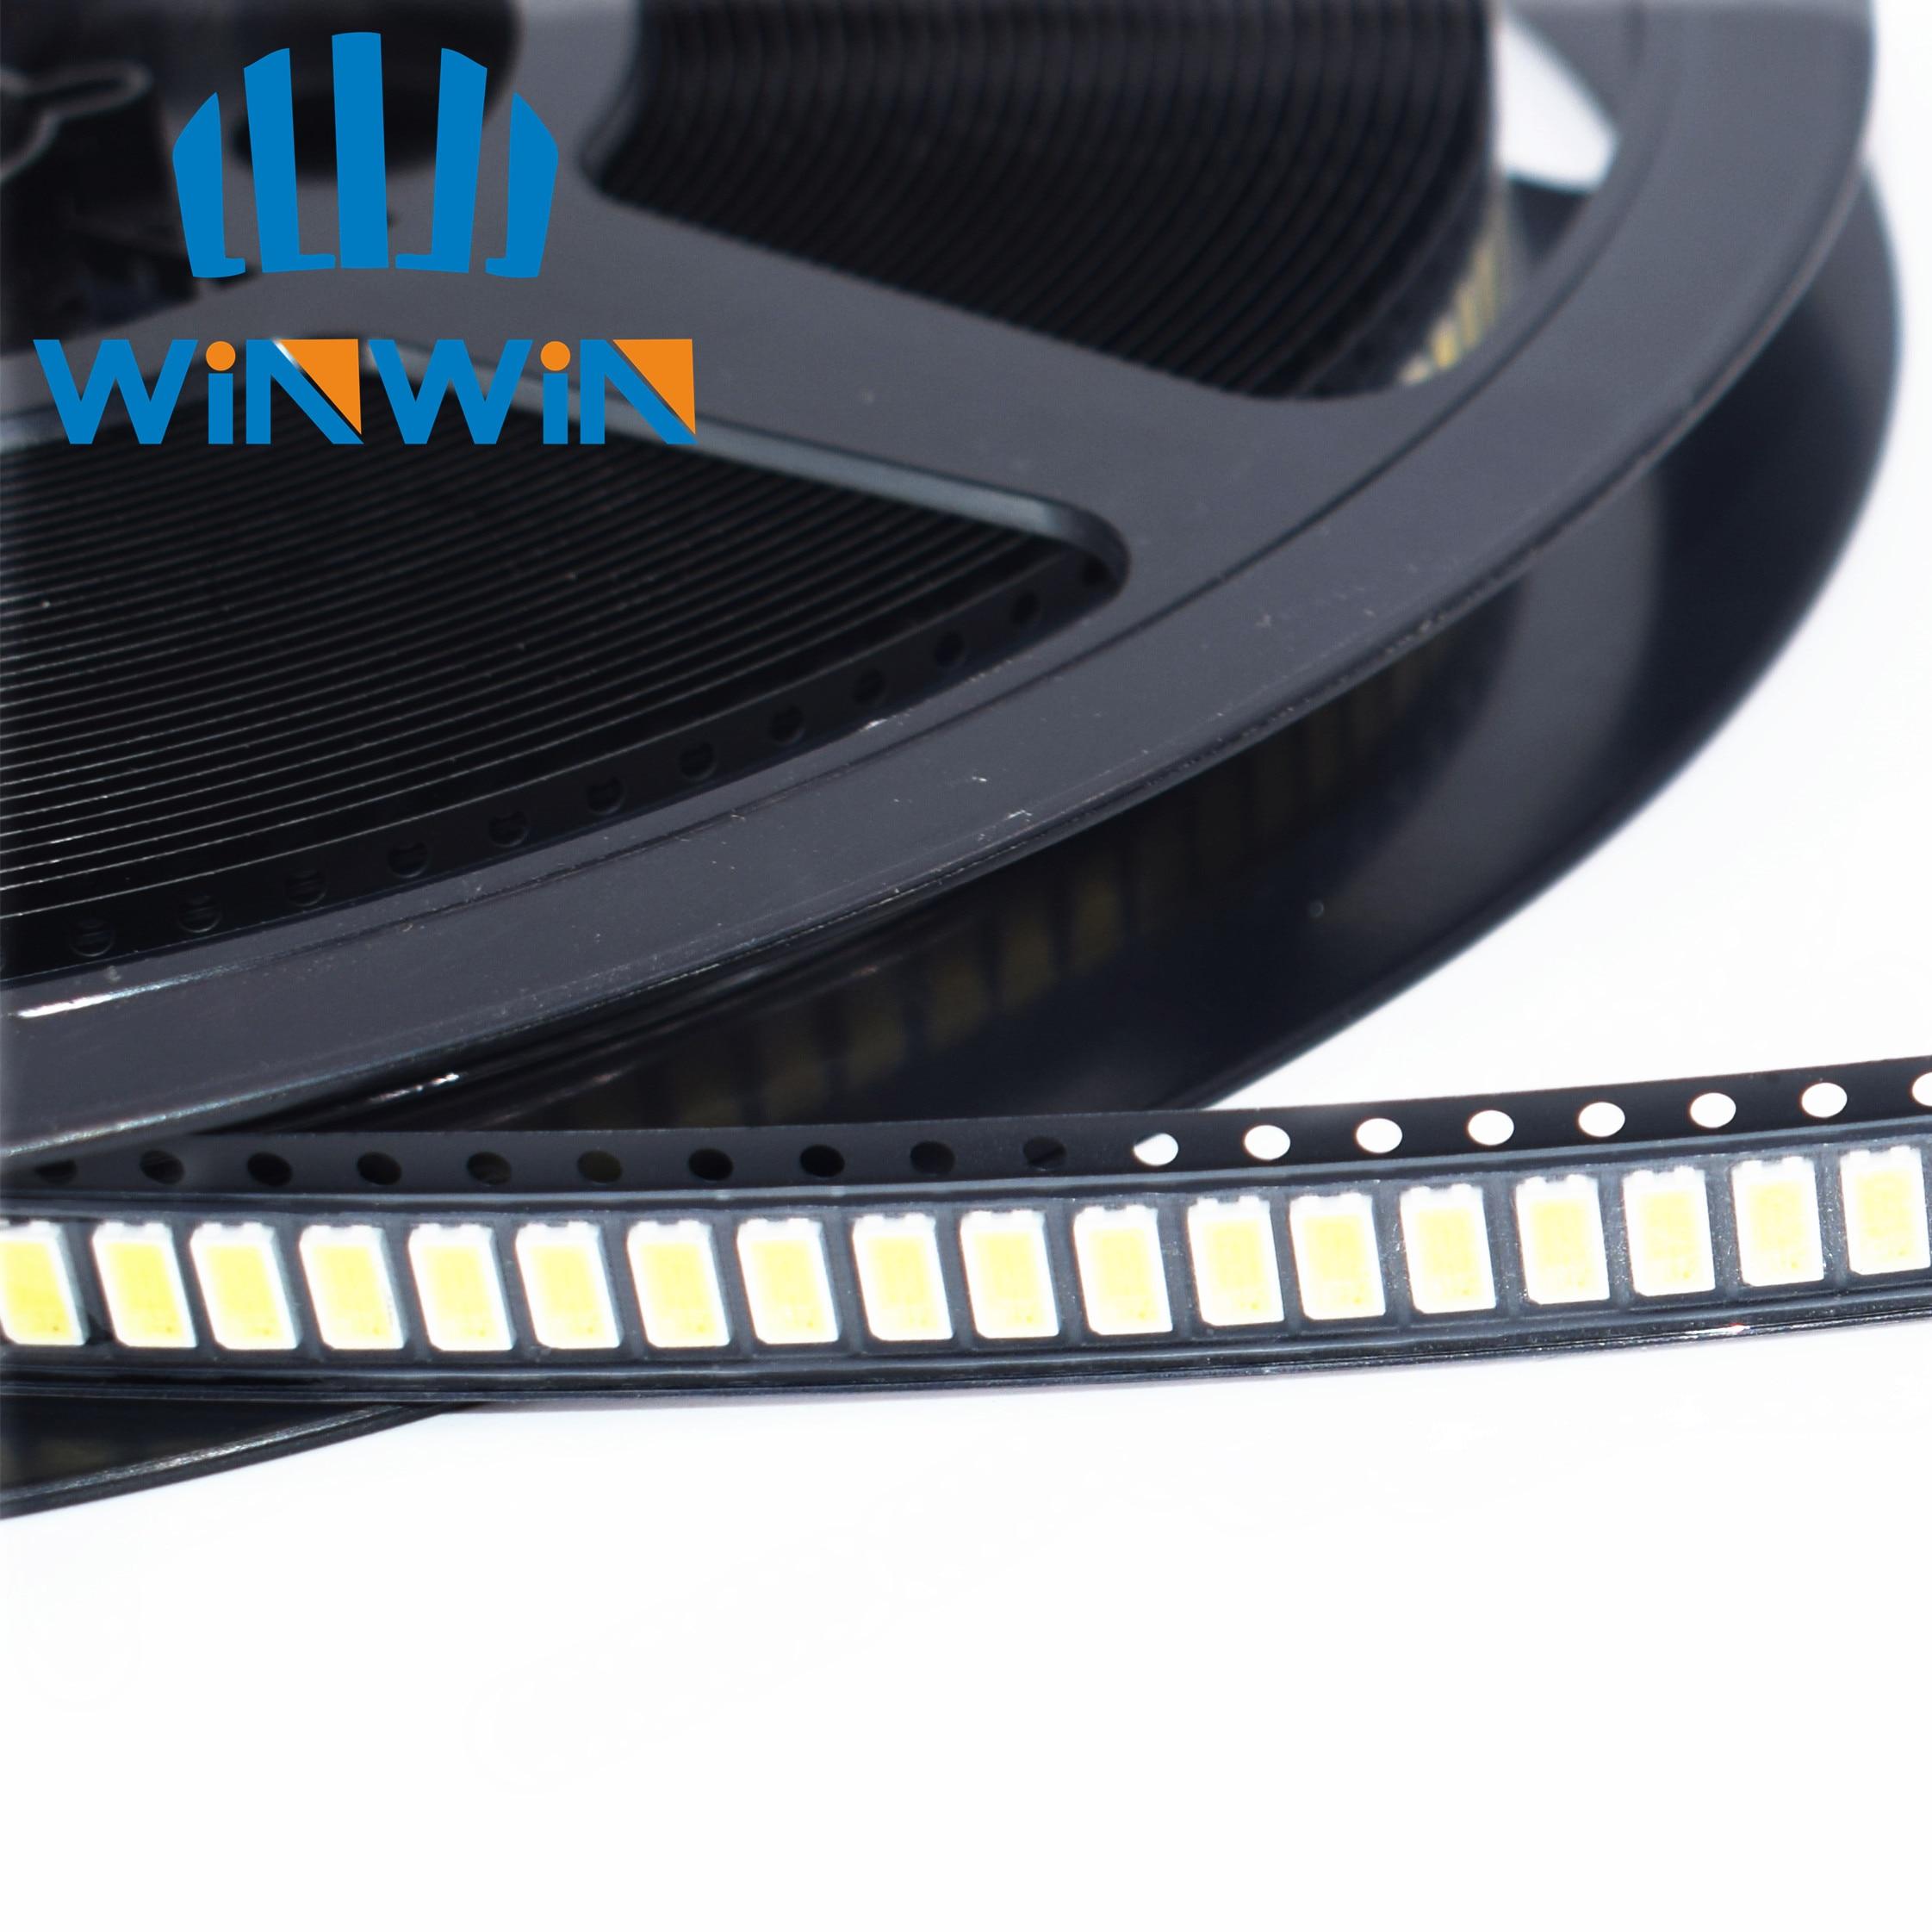 100PCS For SAMSUNG LED Backlight 0.5W 3v 5630 Cool white LCD Backlight for TV TV Application SPBWH1532S1ZVC1BIB